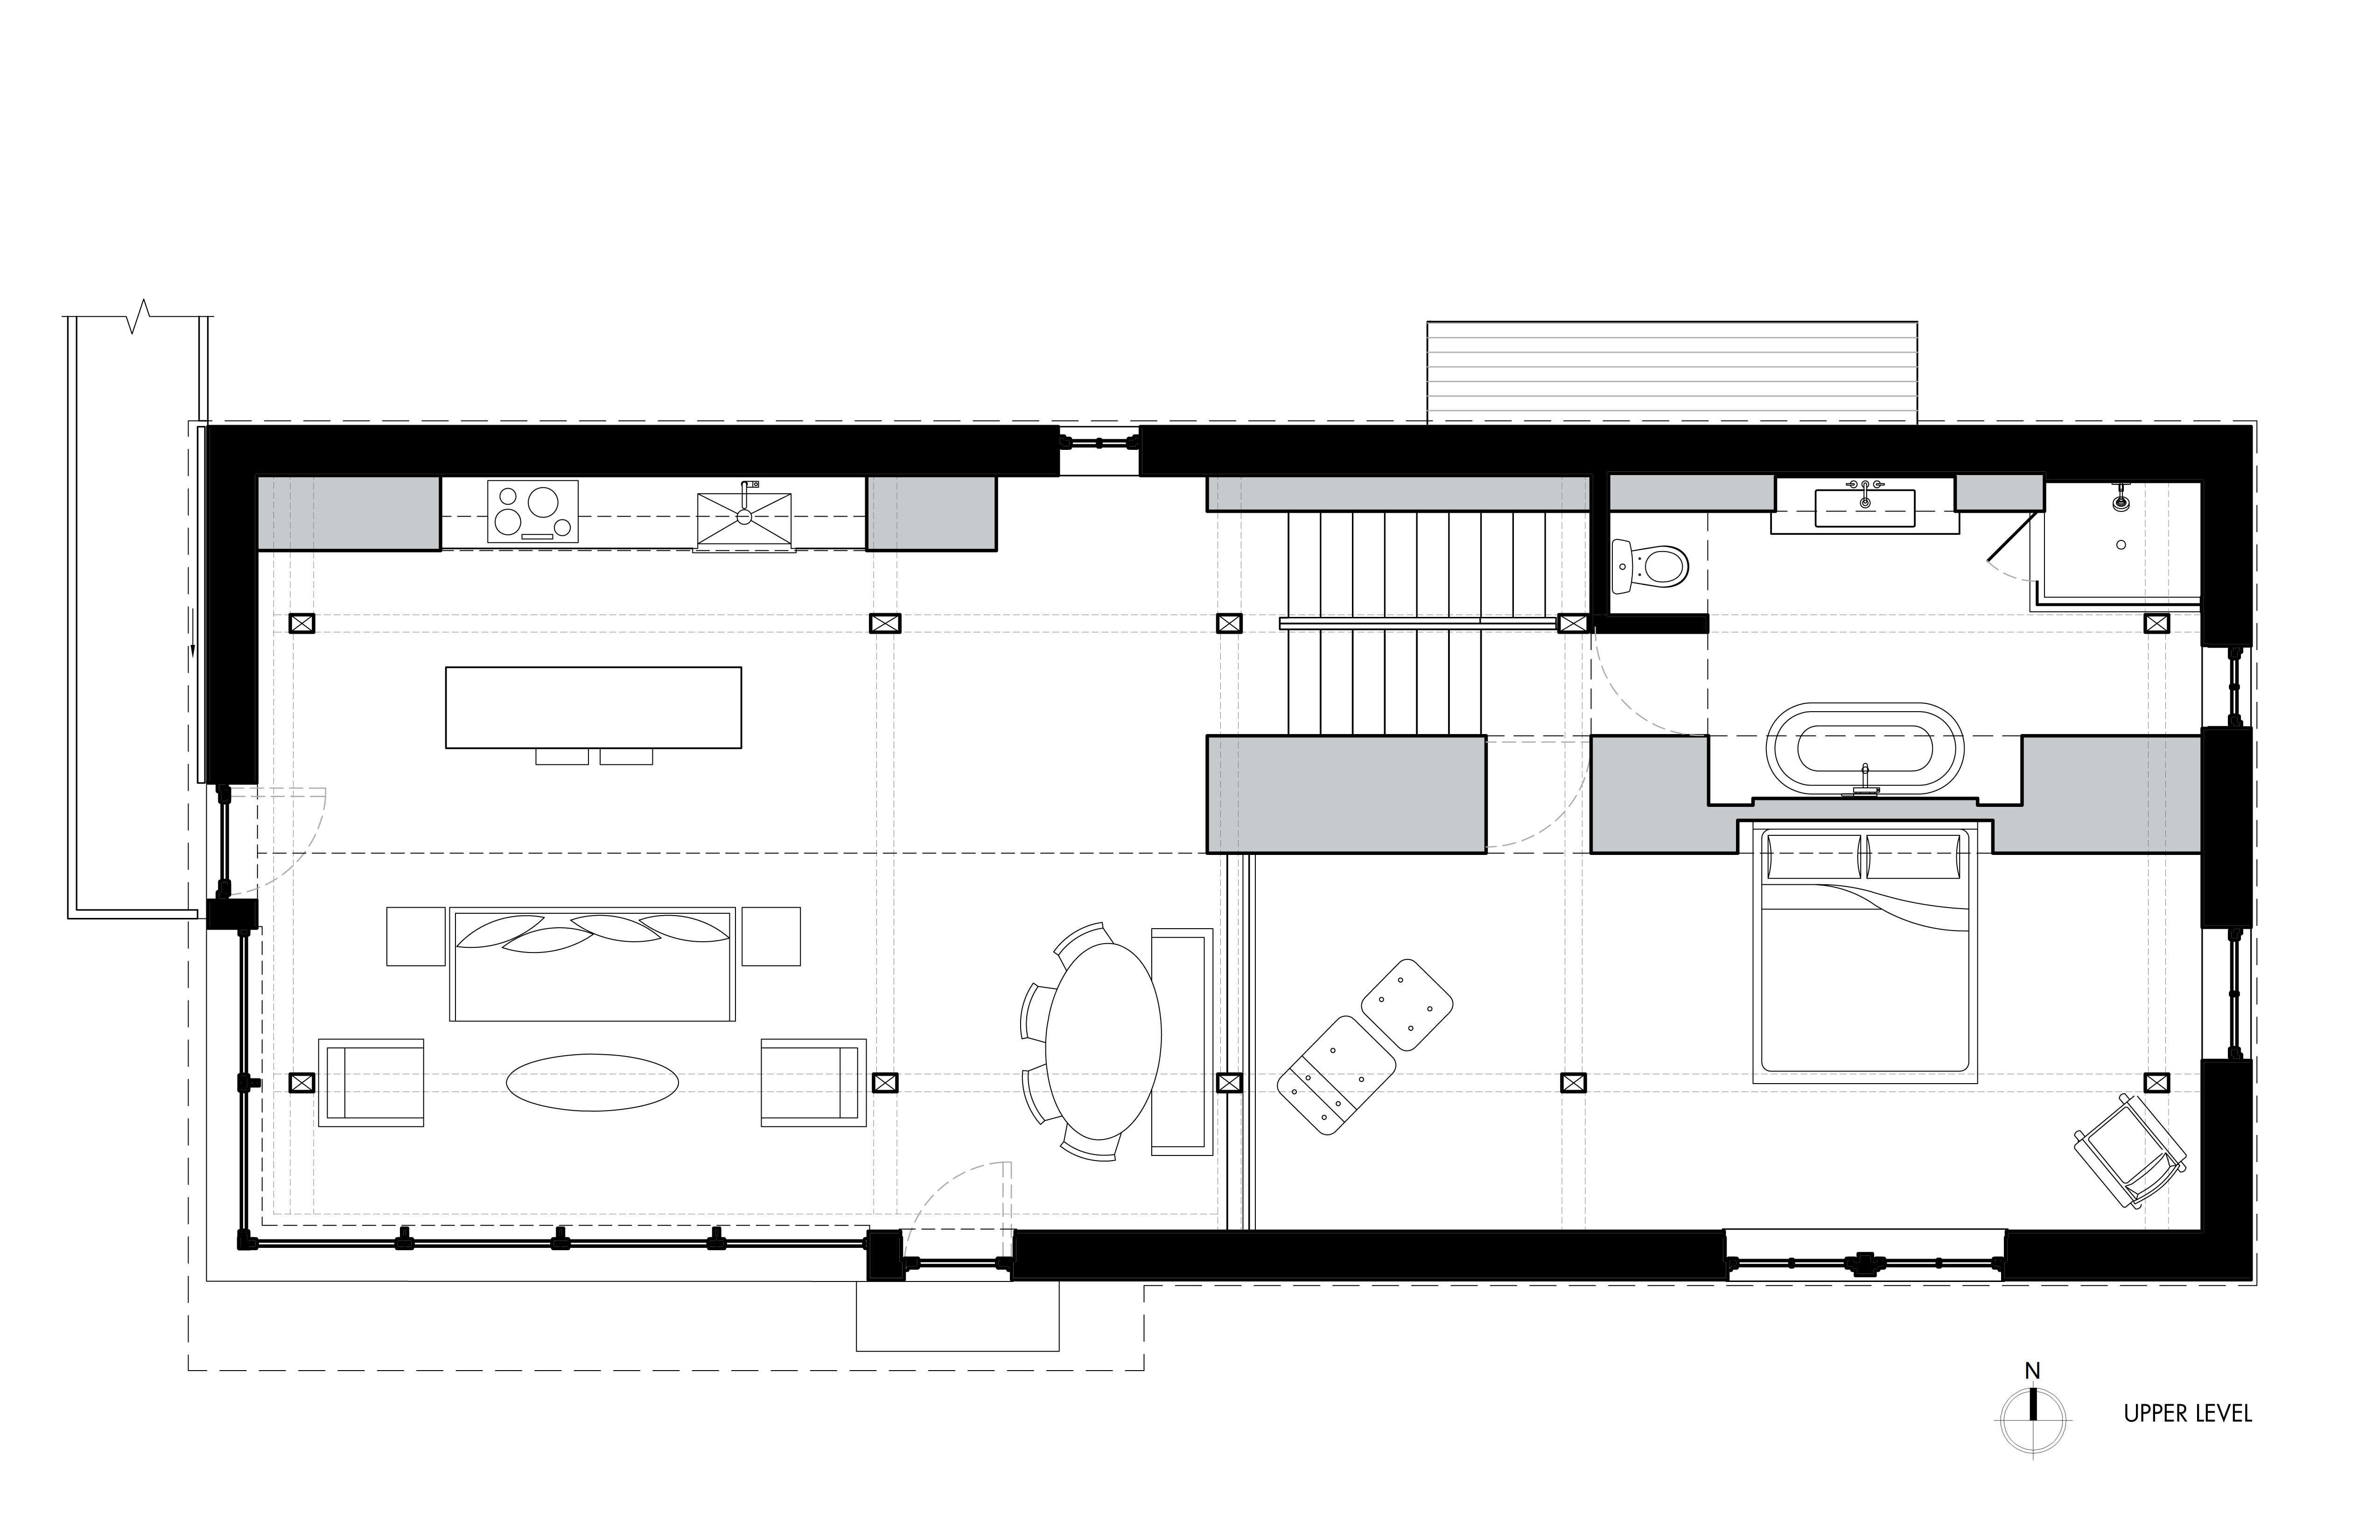 Upper Level Floor Plan Fox Hall By BarlisWedlick